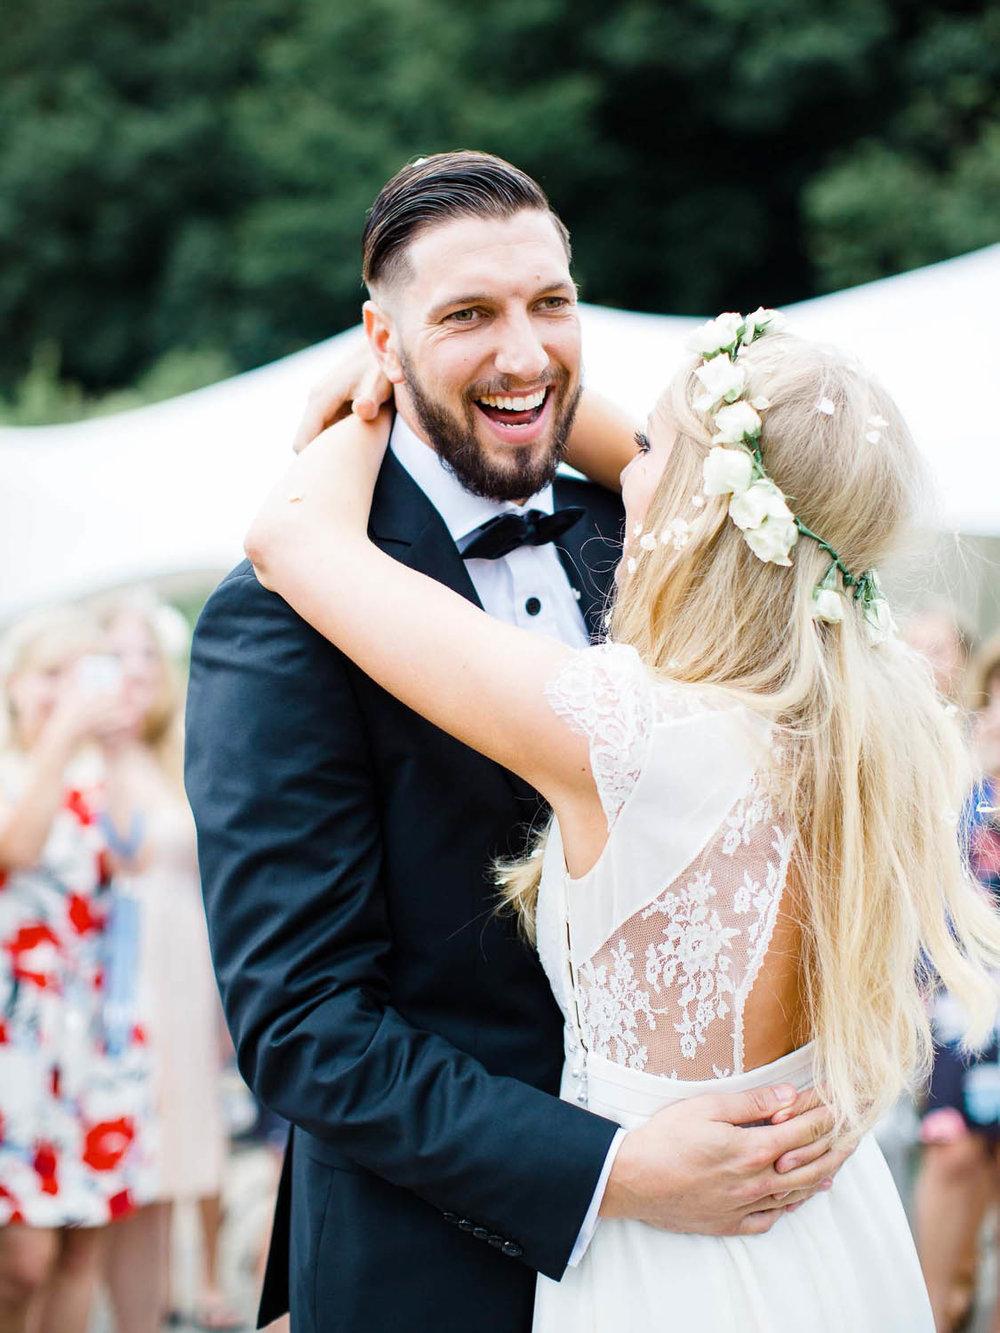 Amy O'Boyle Photography, Destination & UK Fine Art Film Wedding Photographer, Hastings Wedding-32.jpg